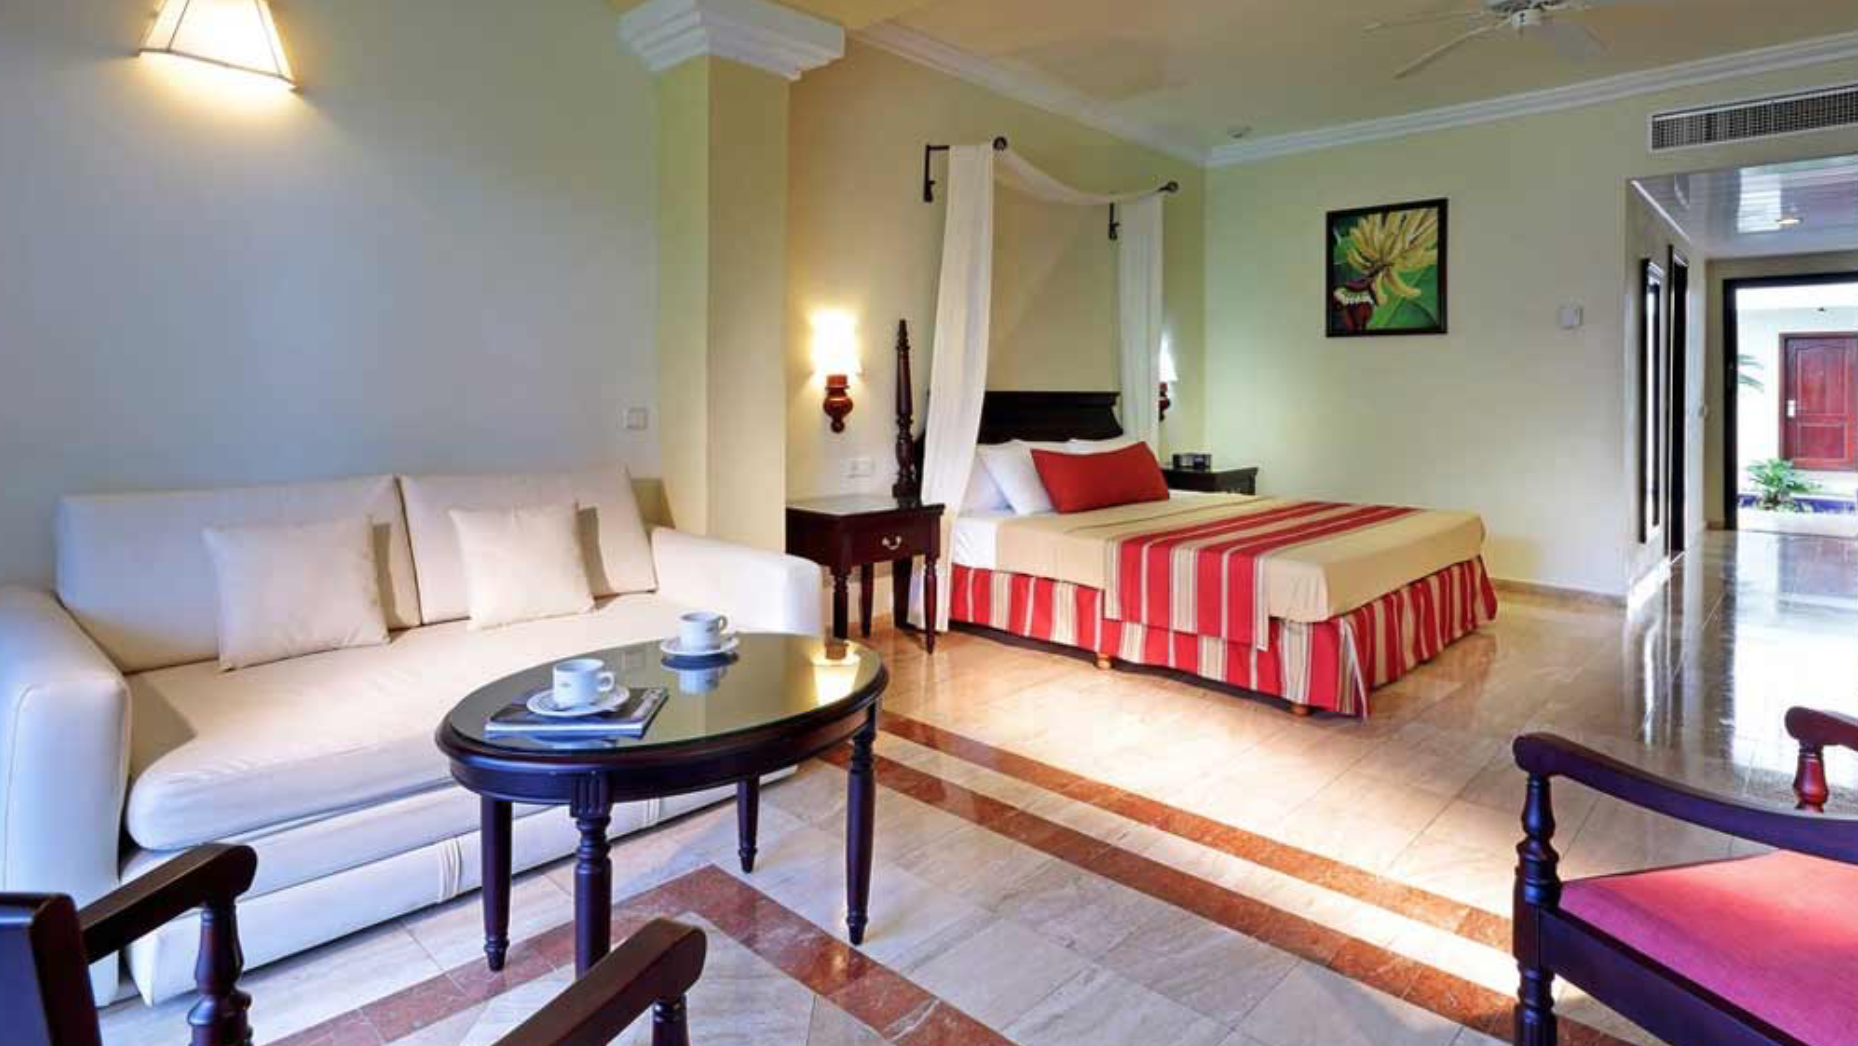 Grand Palladium Resort's Renovation